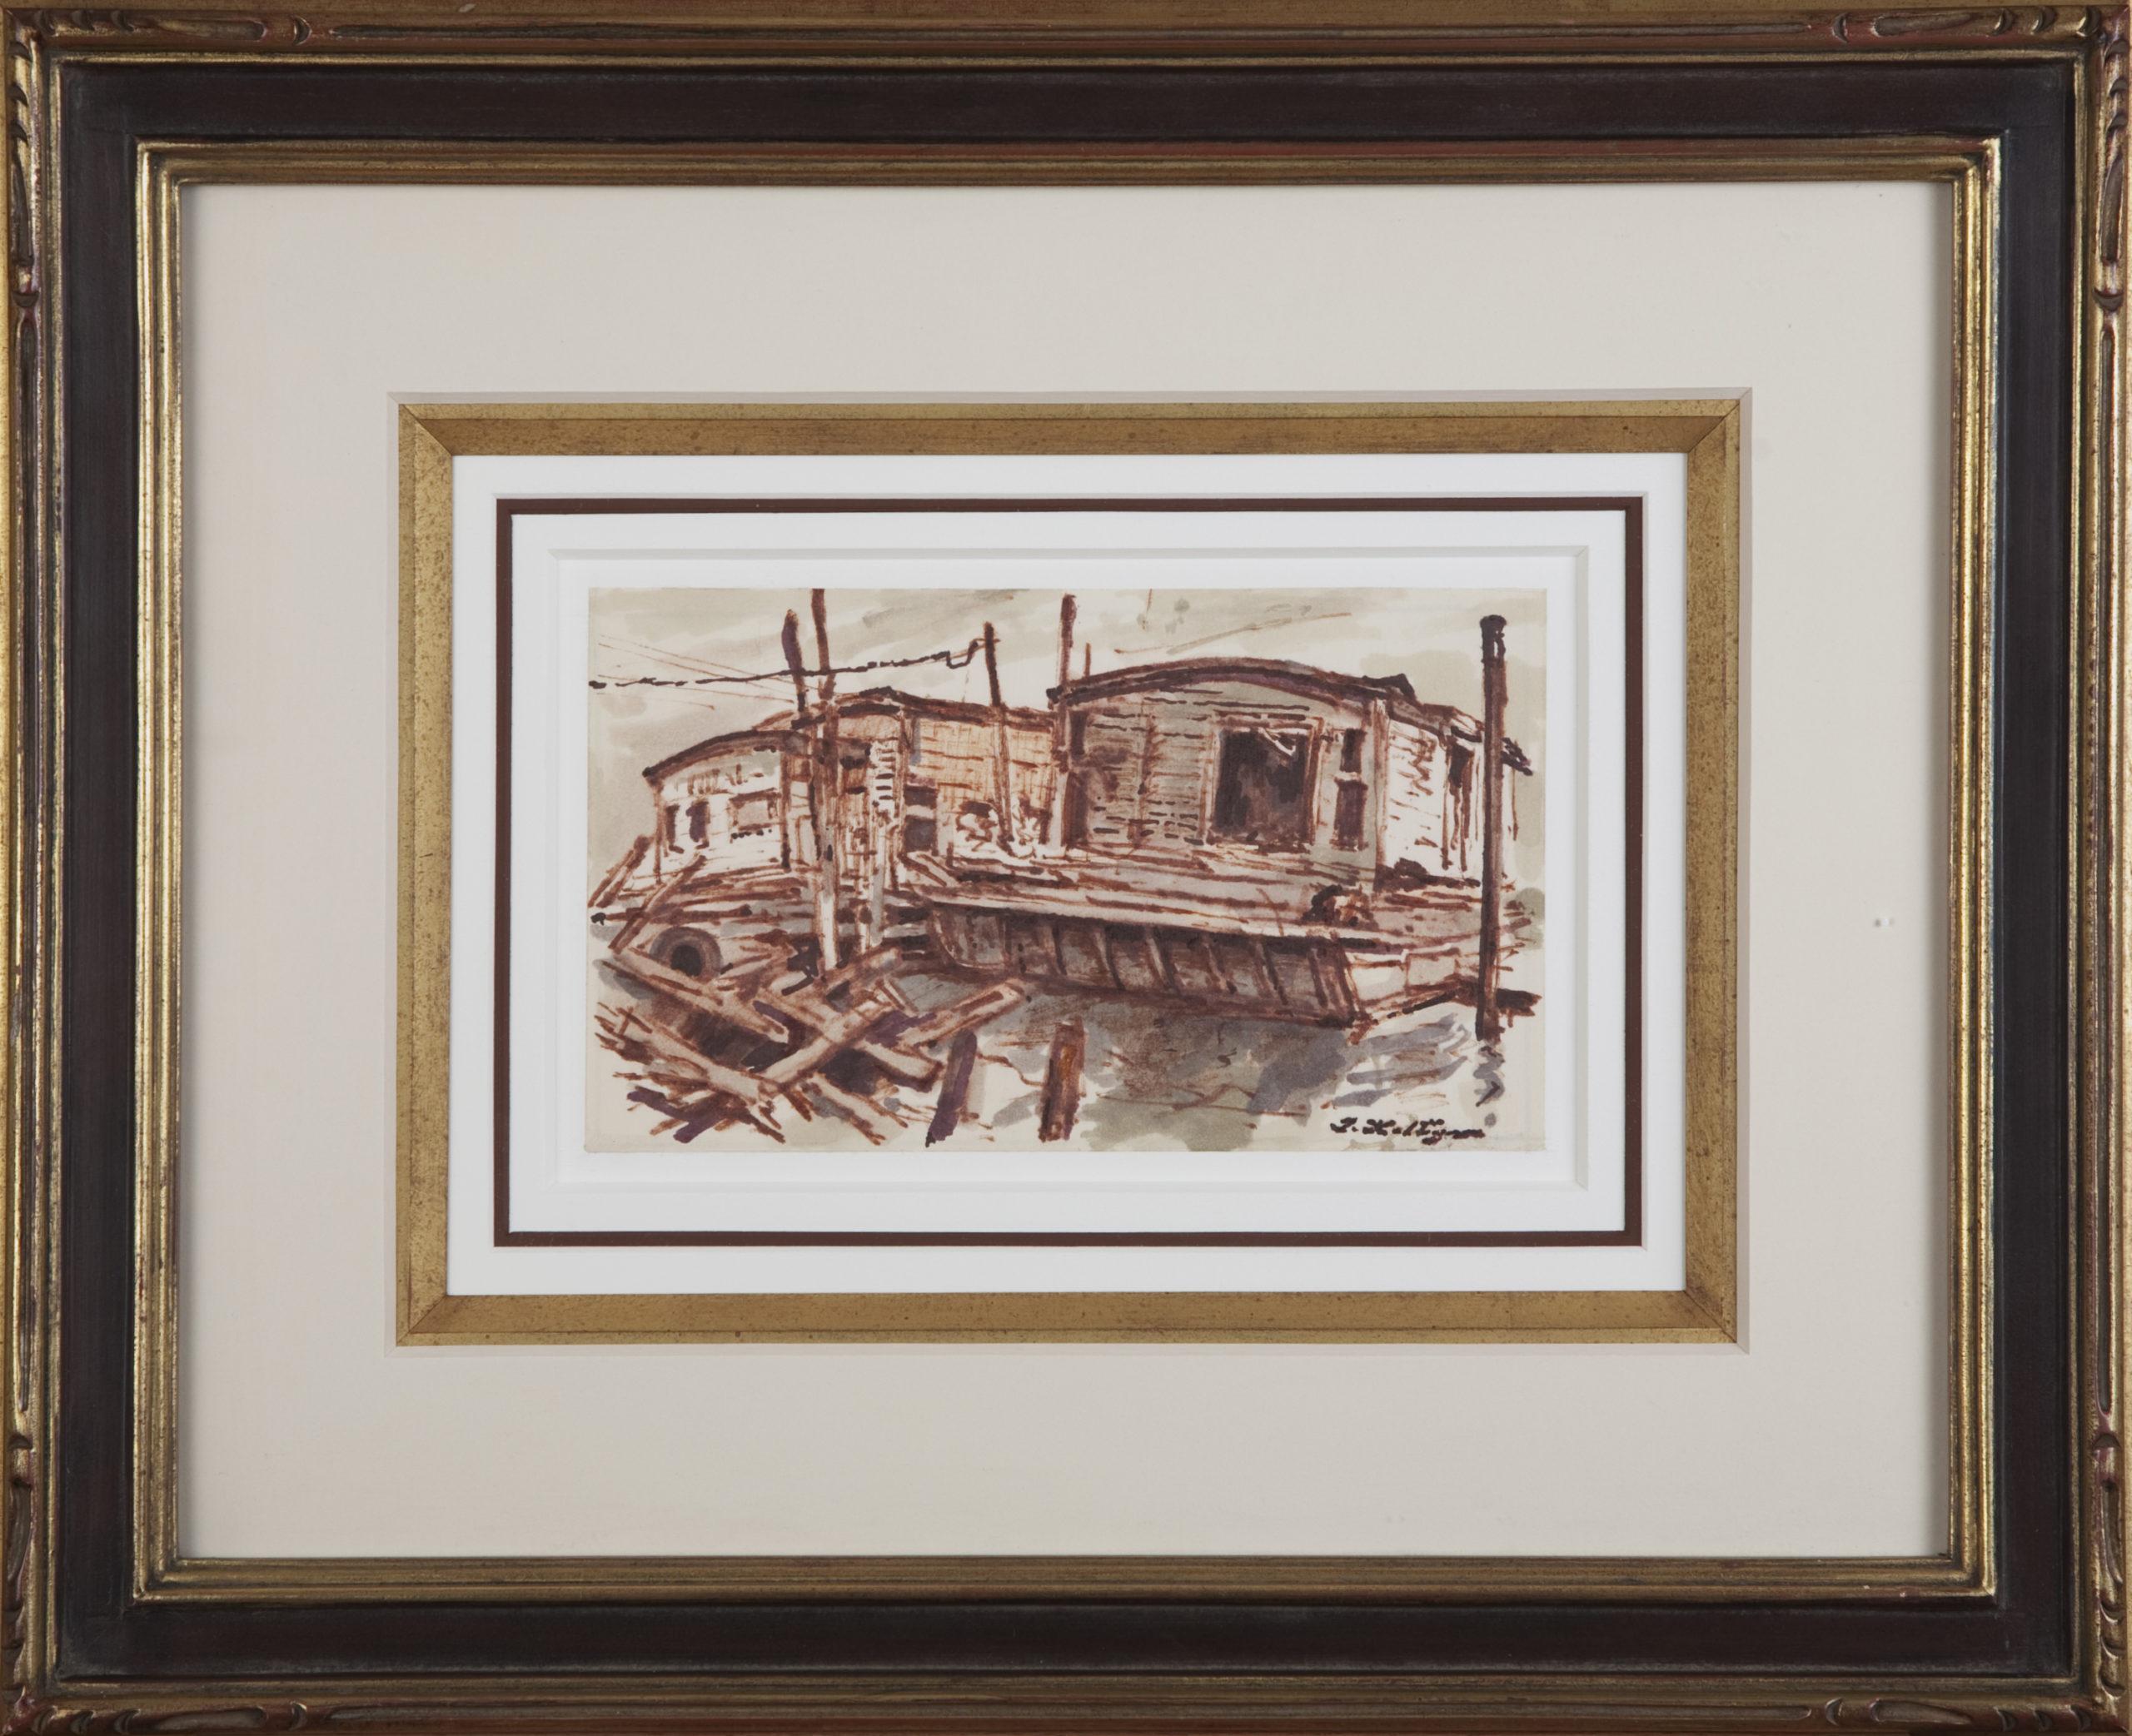 079 Barges on the Hudson 1970 - Marker - 8 x 5 - Frame: 18 x 14.5 x 1.5